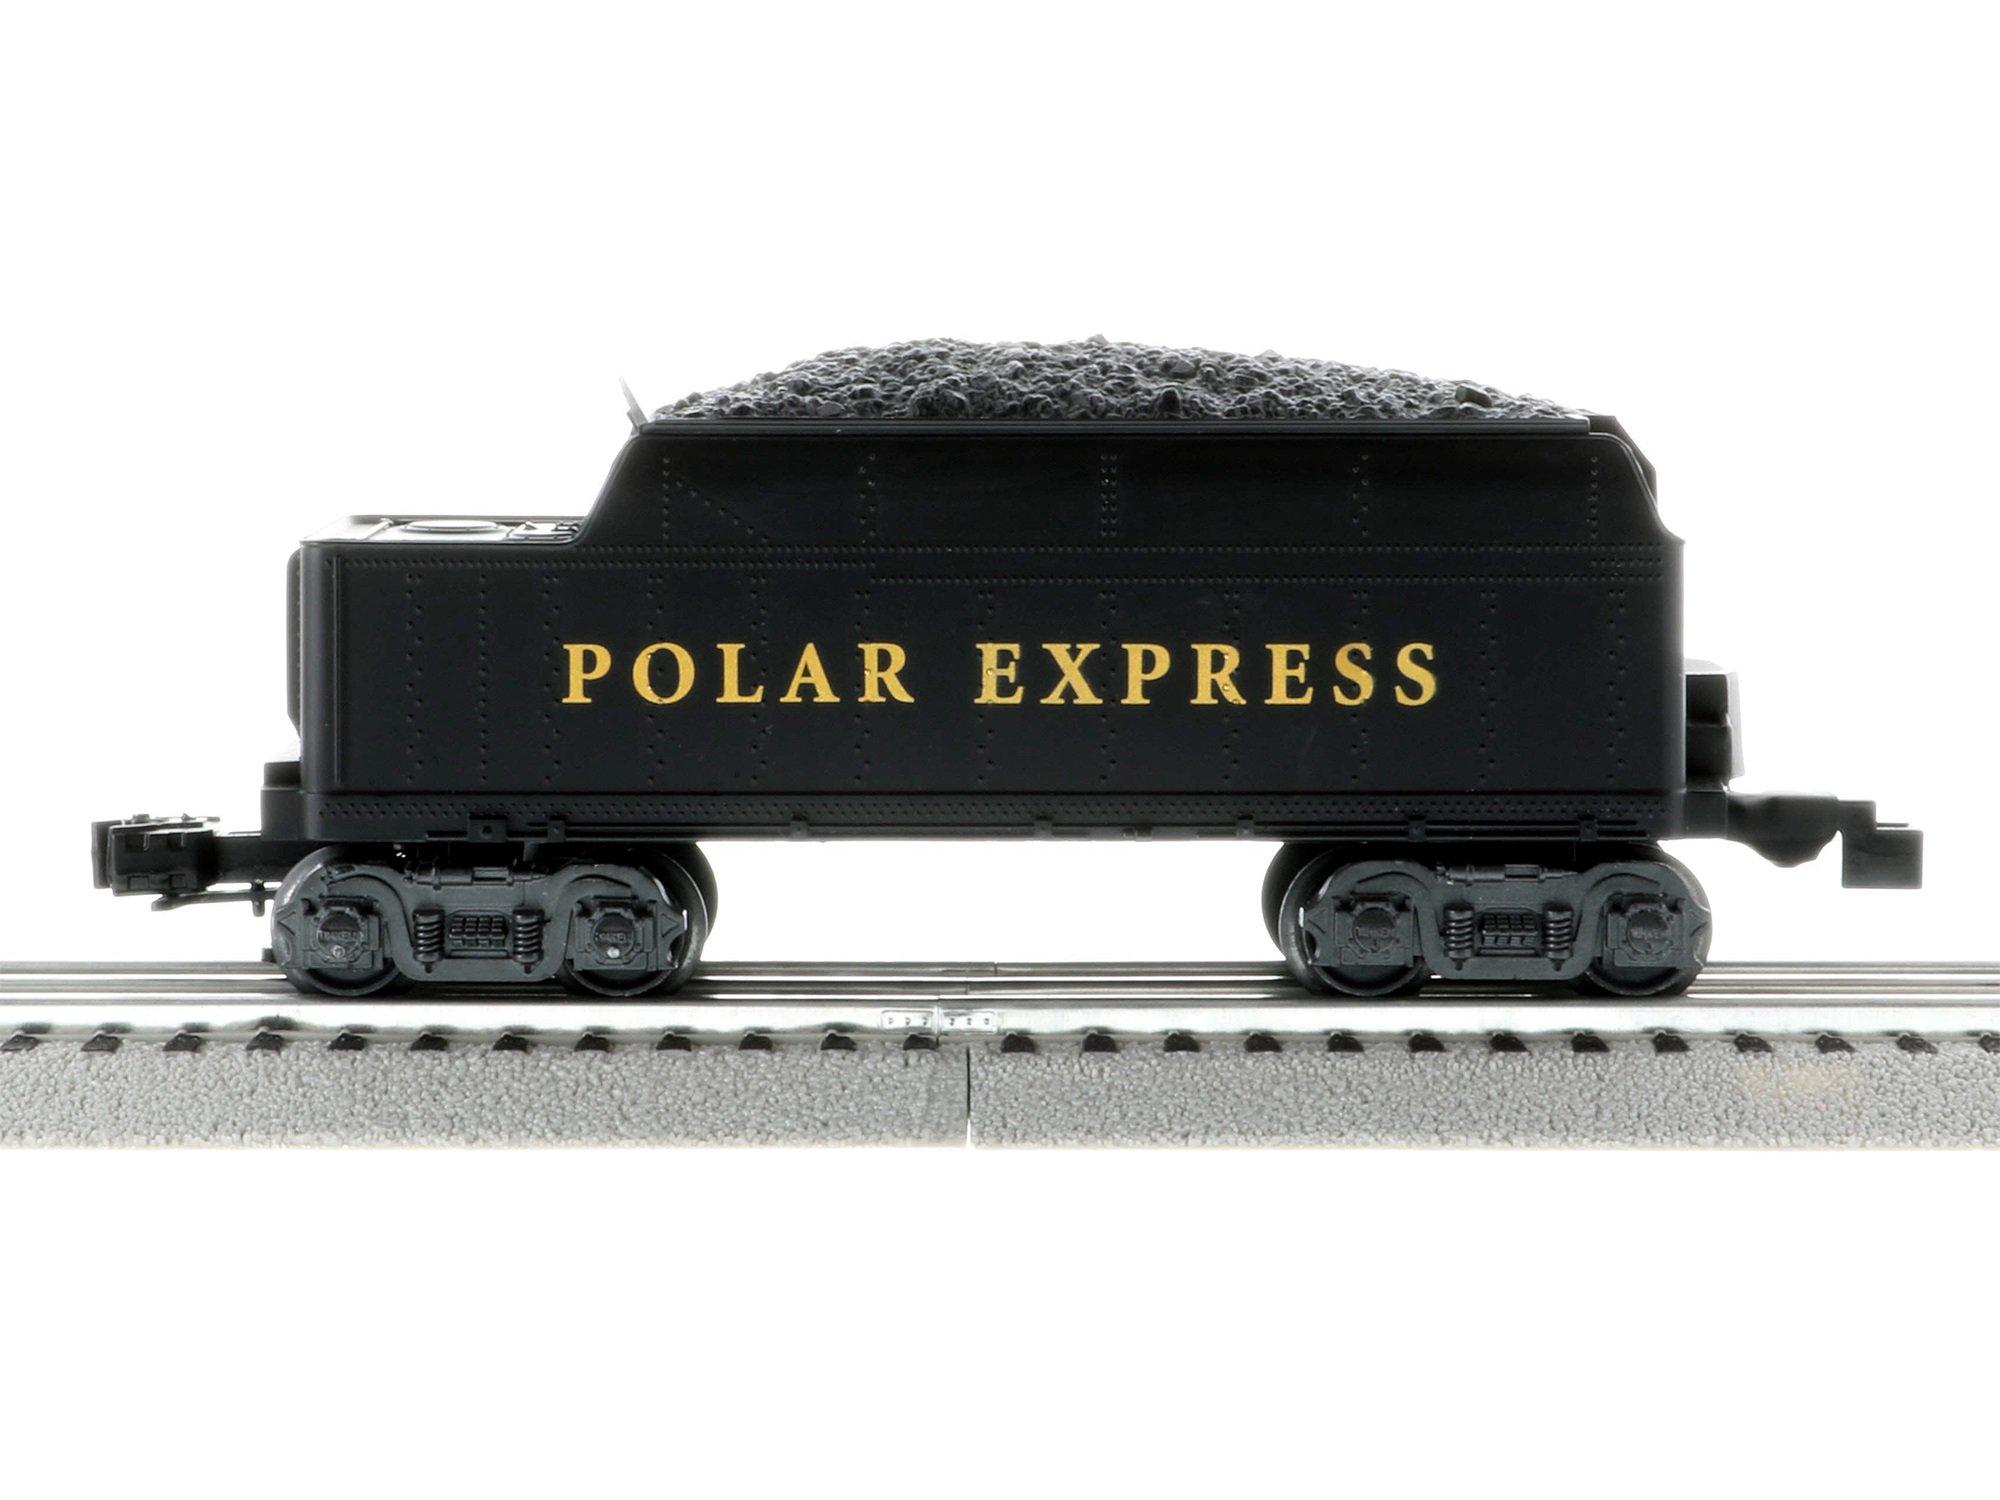 Lionel The Polar Express LionChief Train Set with Bluetooth Train Set by Lionel (Image #10)